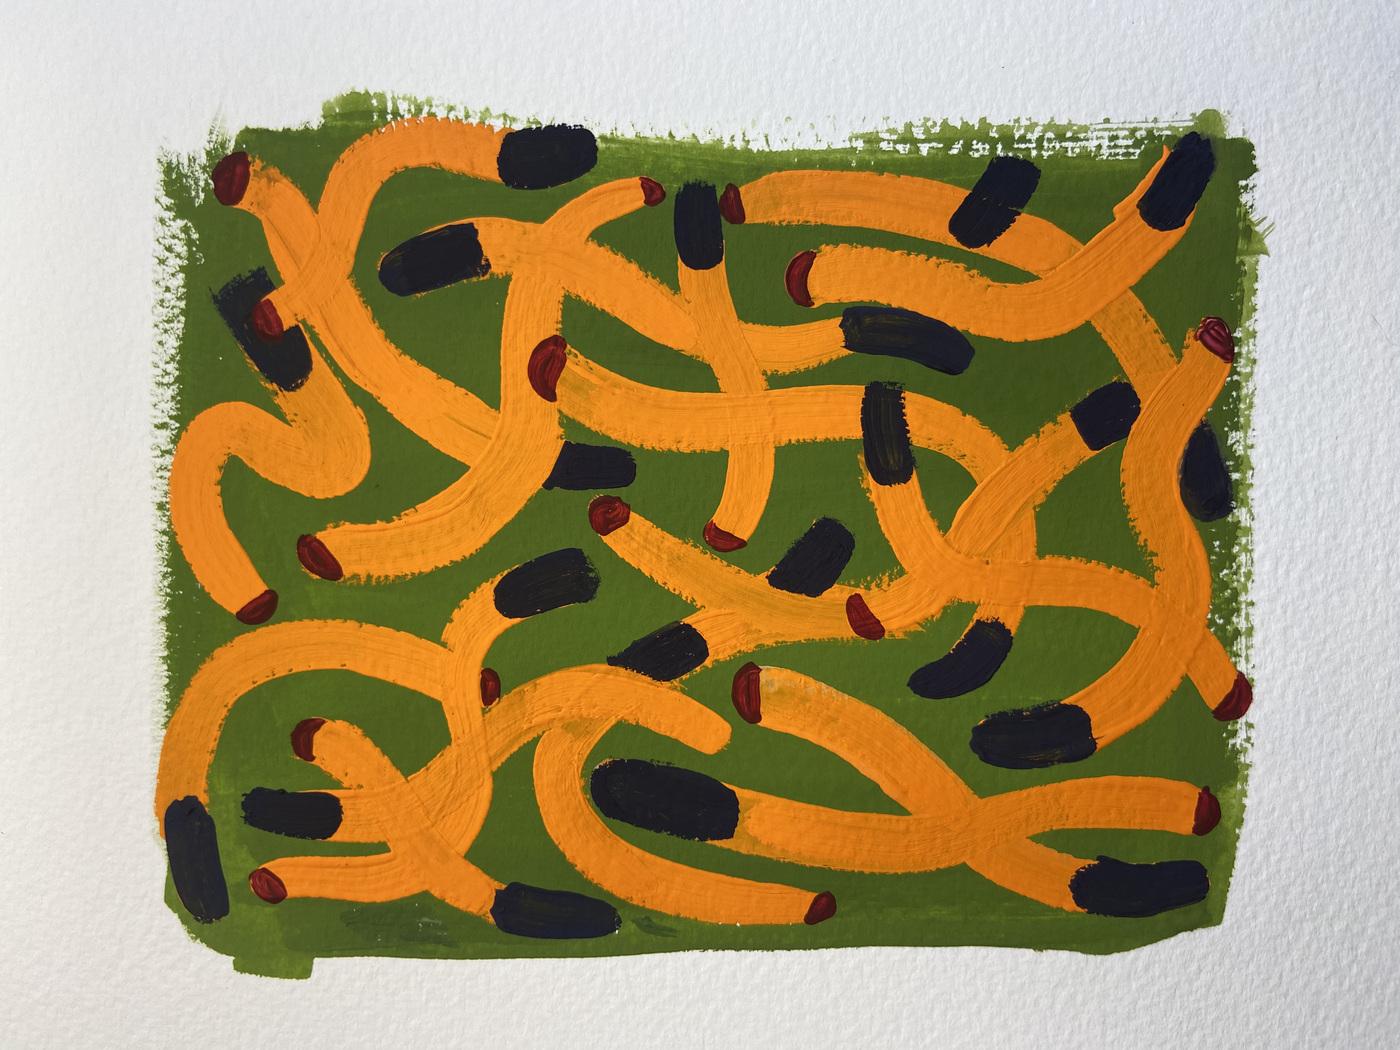 Anna Choutova - Cigarette Fever Dream 3 Goache on Paper21 cm x 15 cm